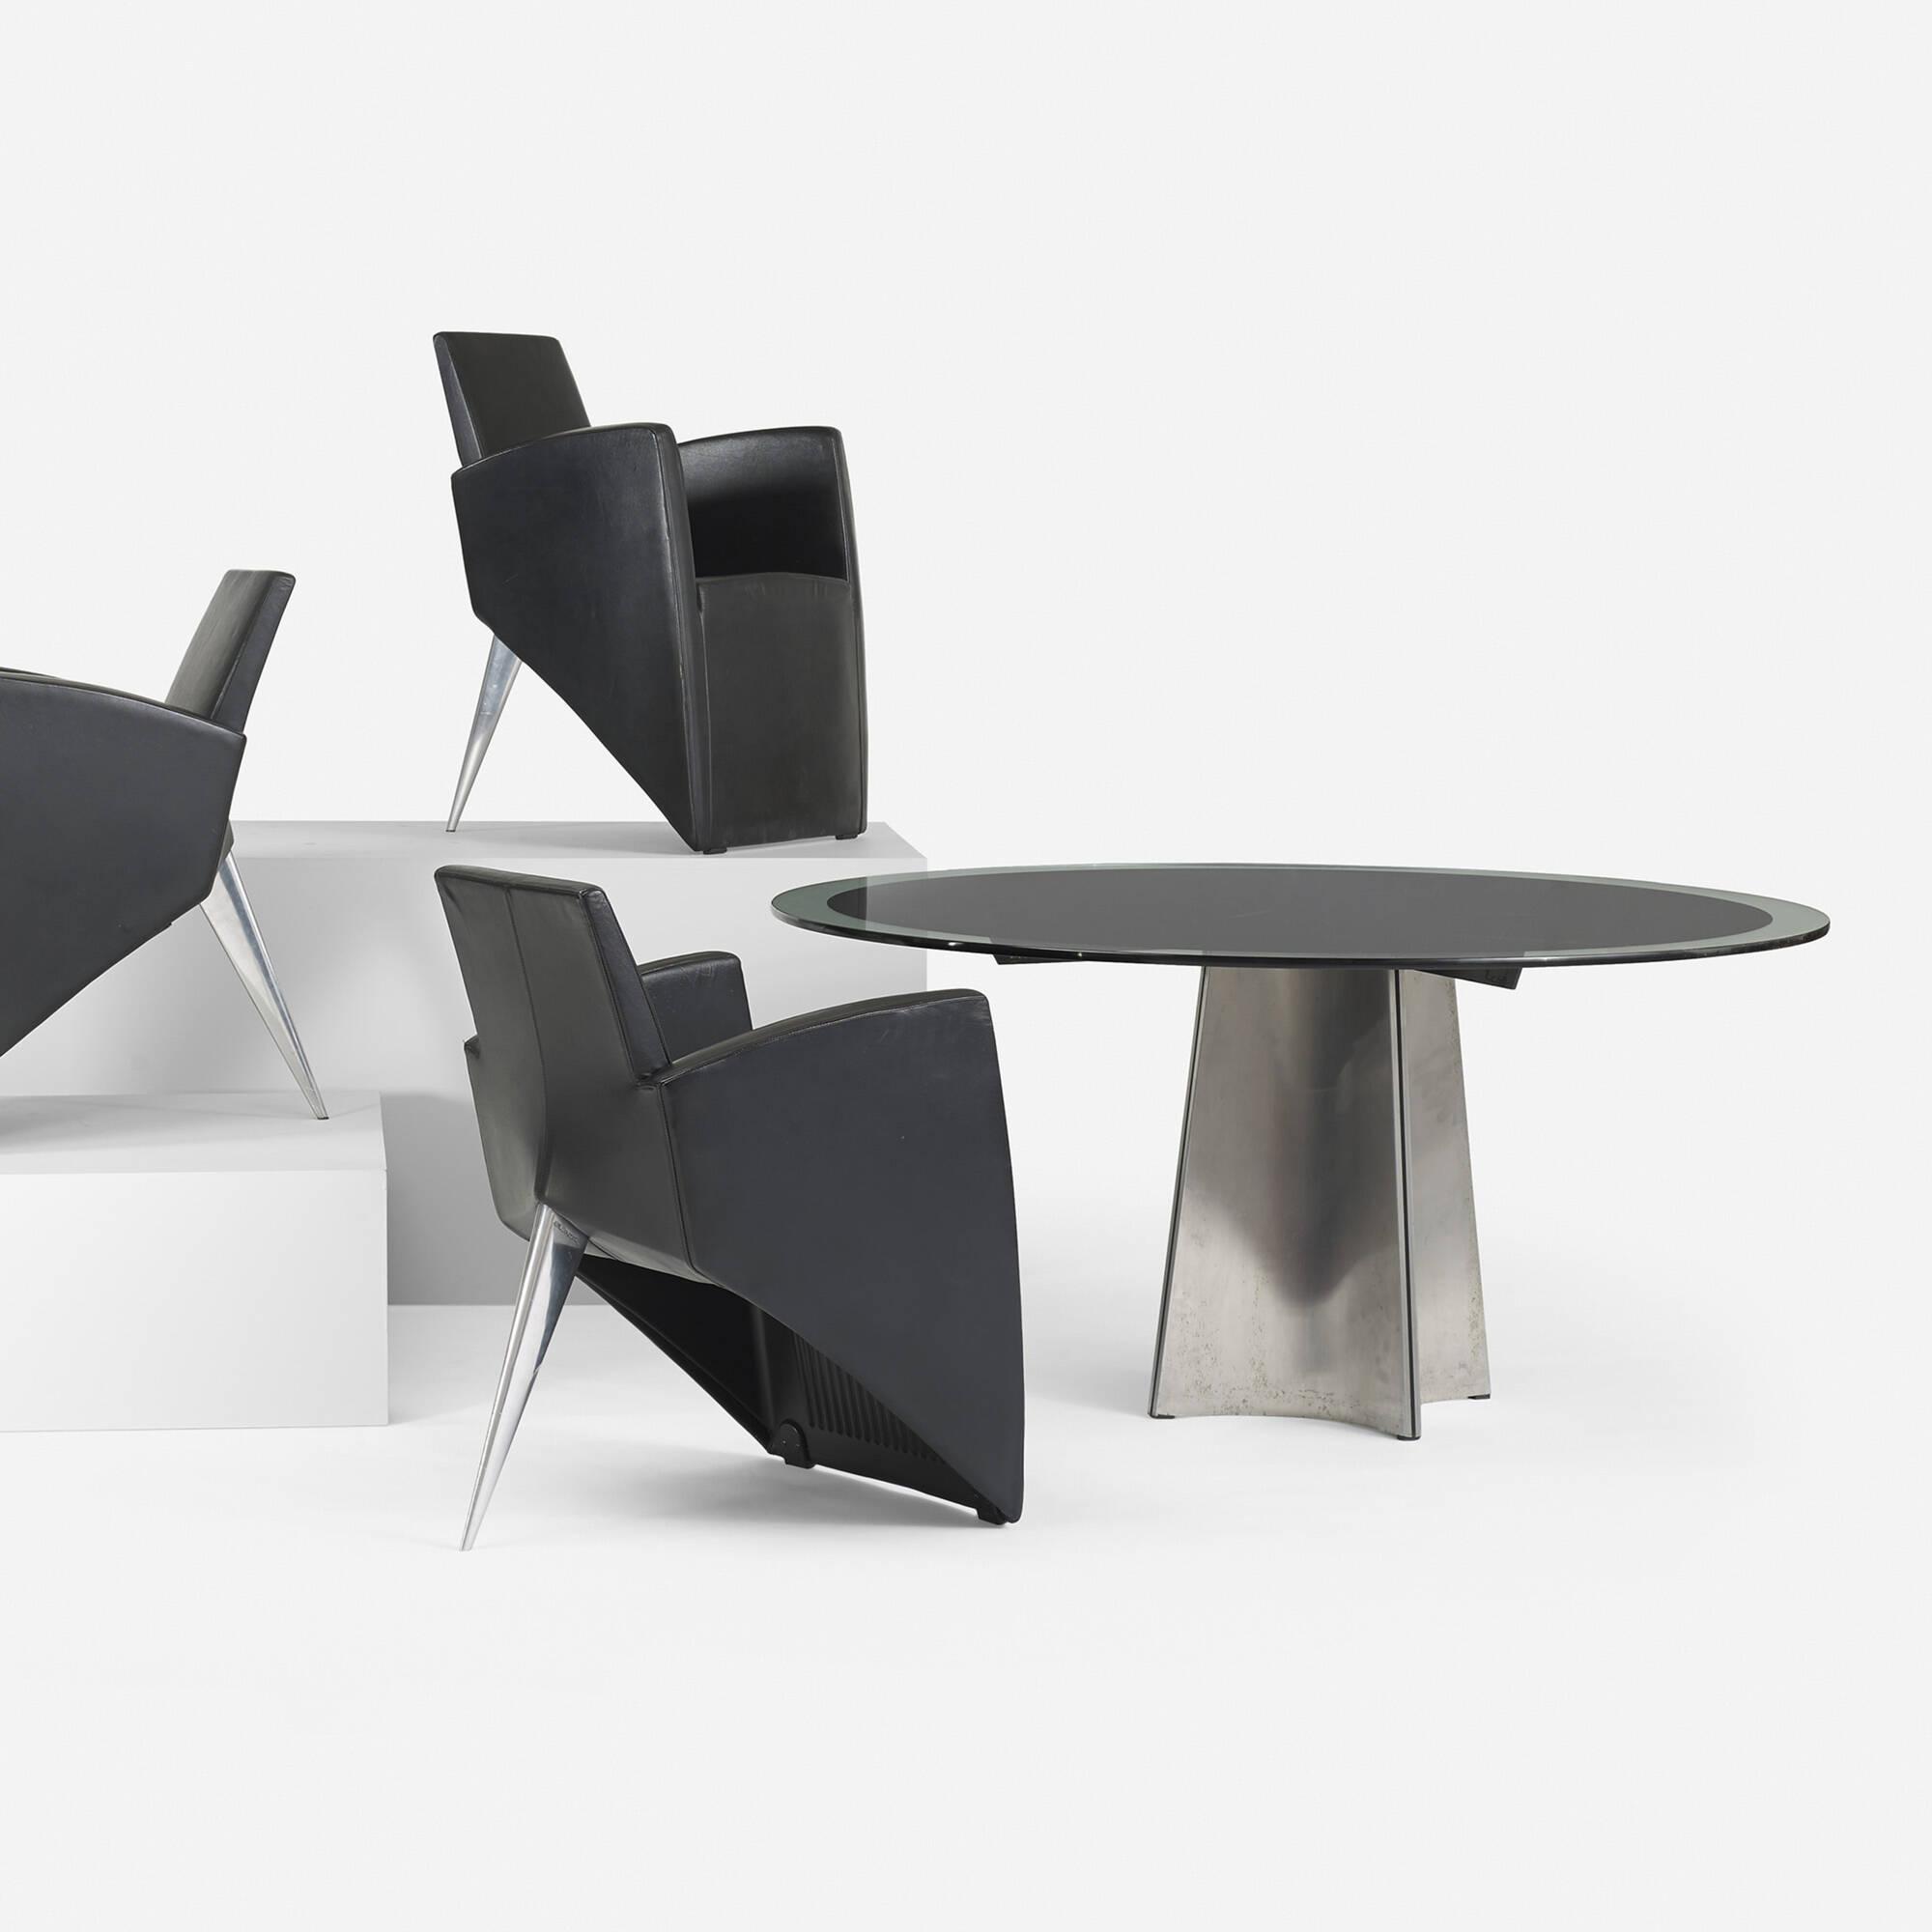 362 luigi saccardo dining table for Table design 2014